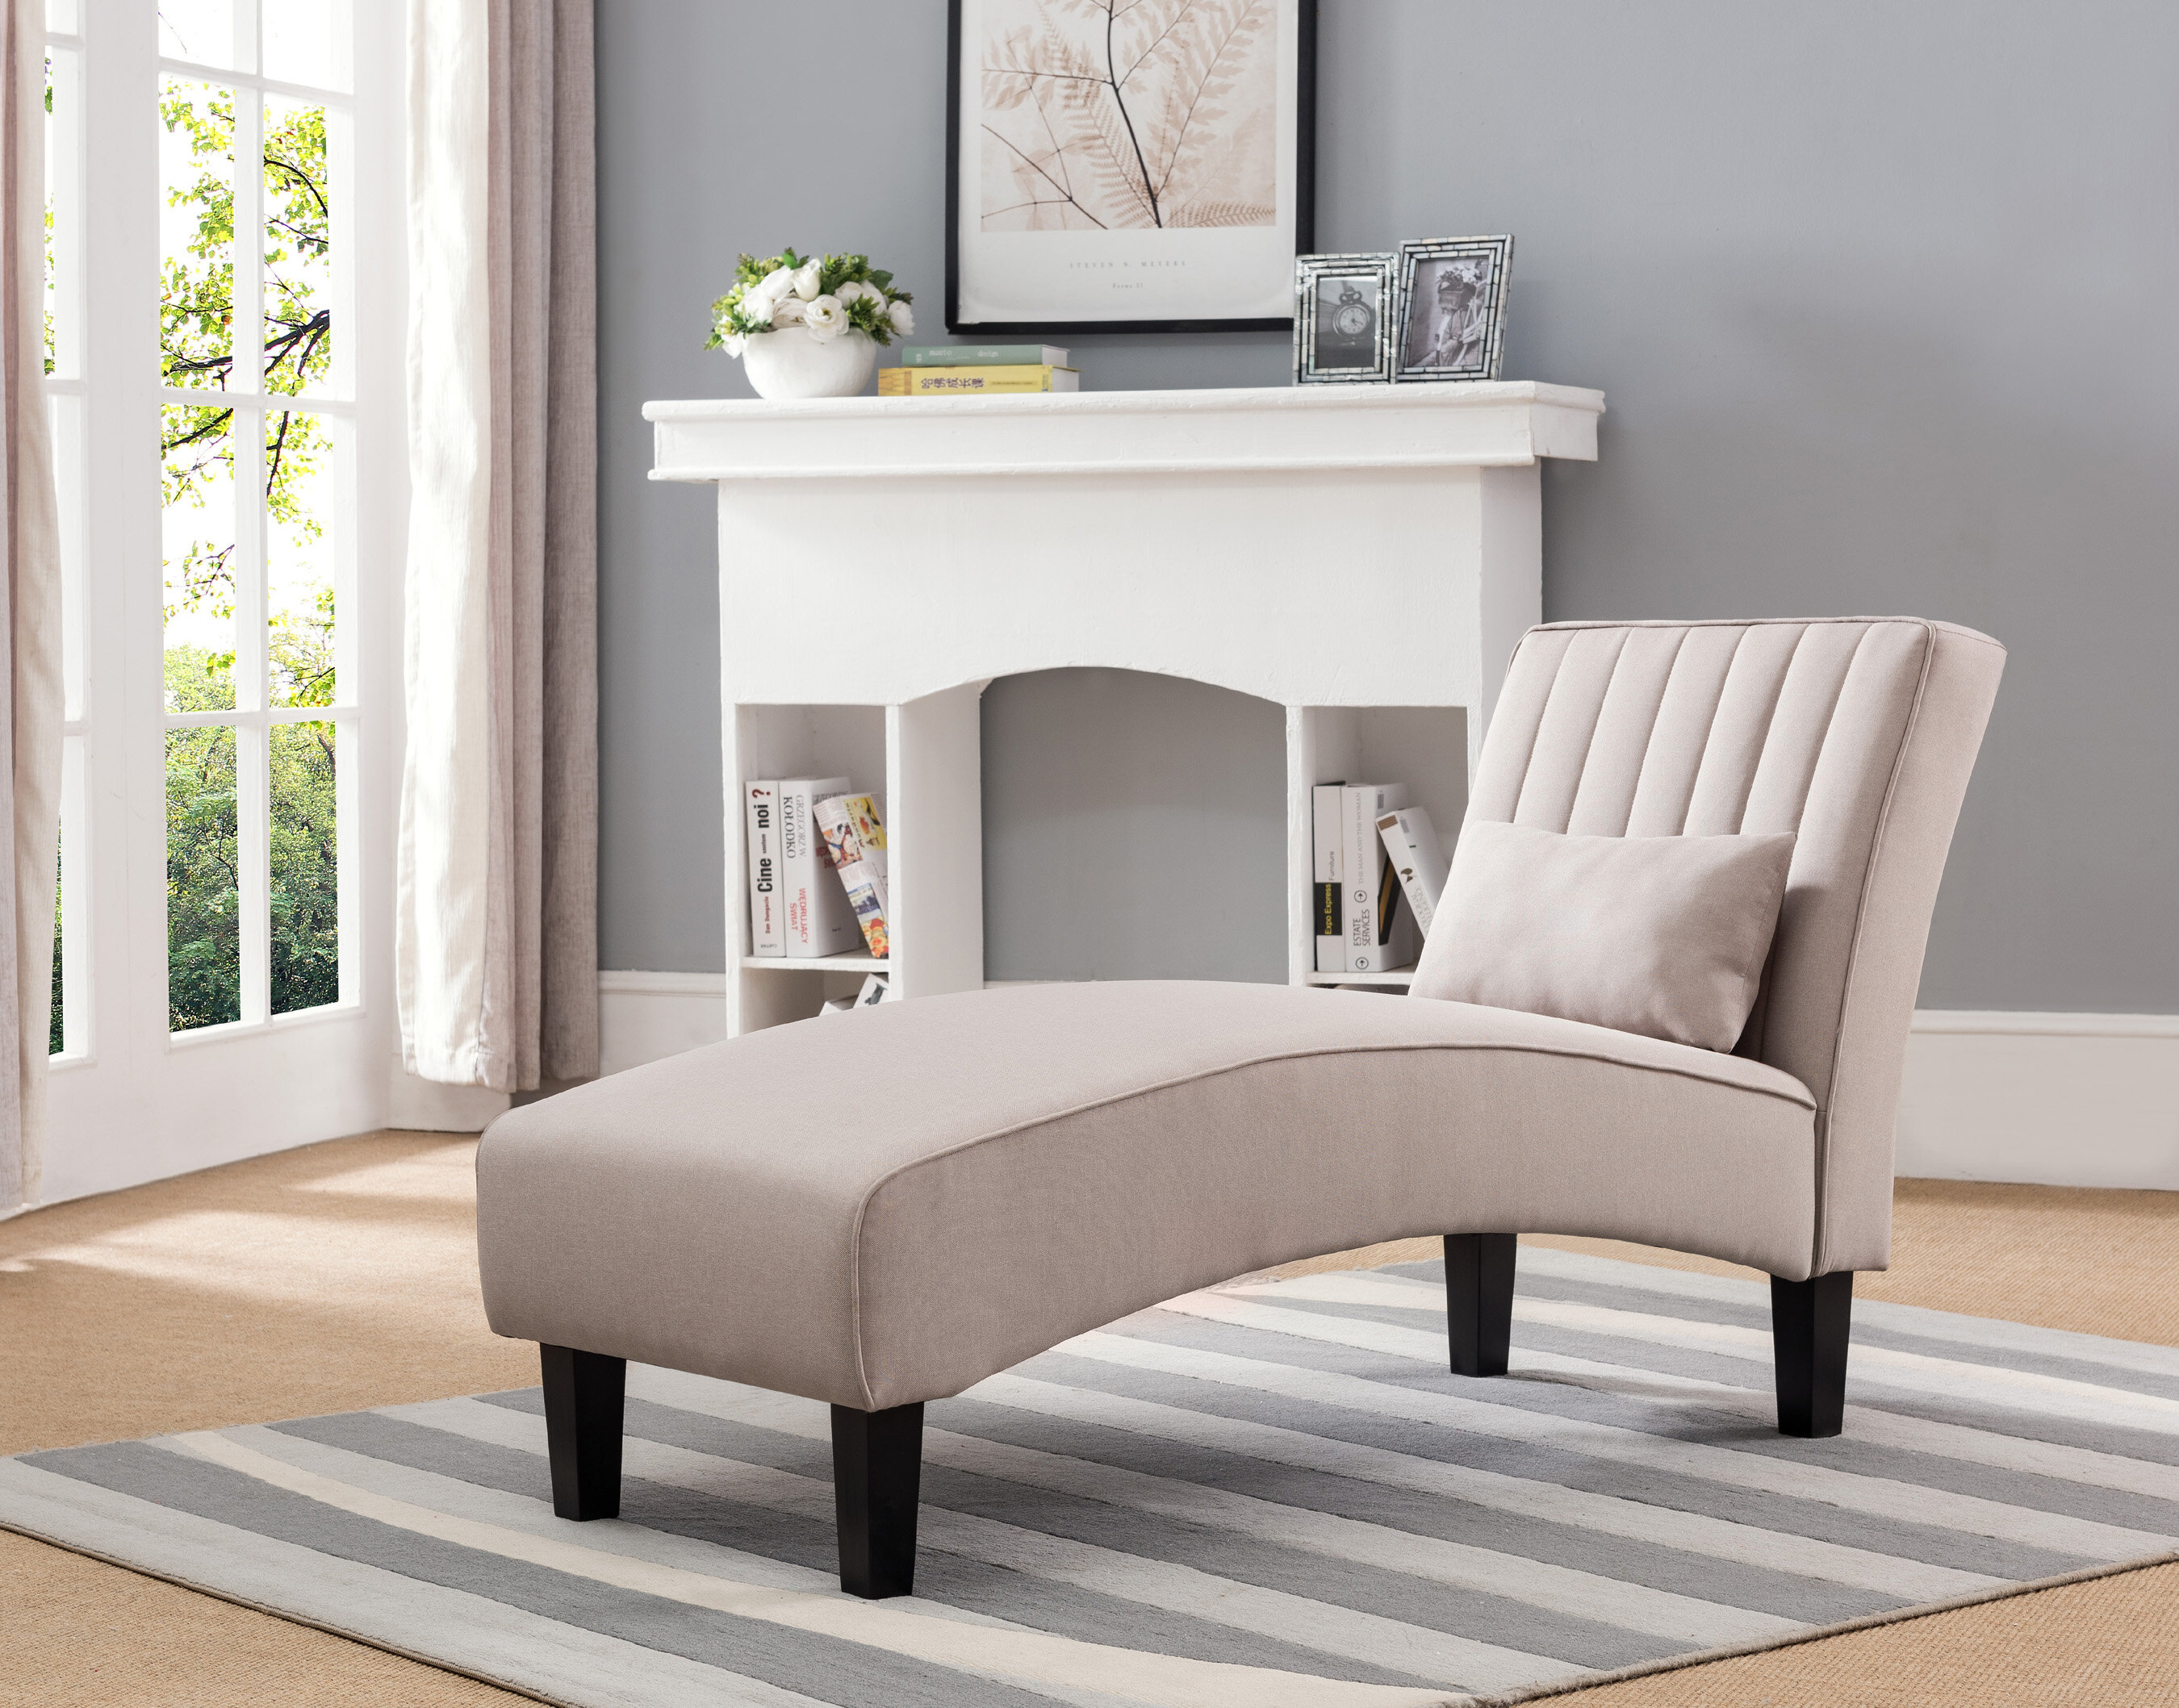 Lexicon Lambart Chaise Lounge Brown